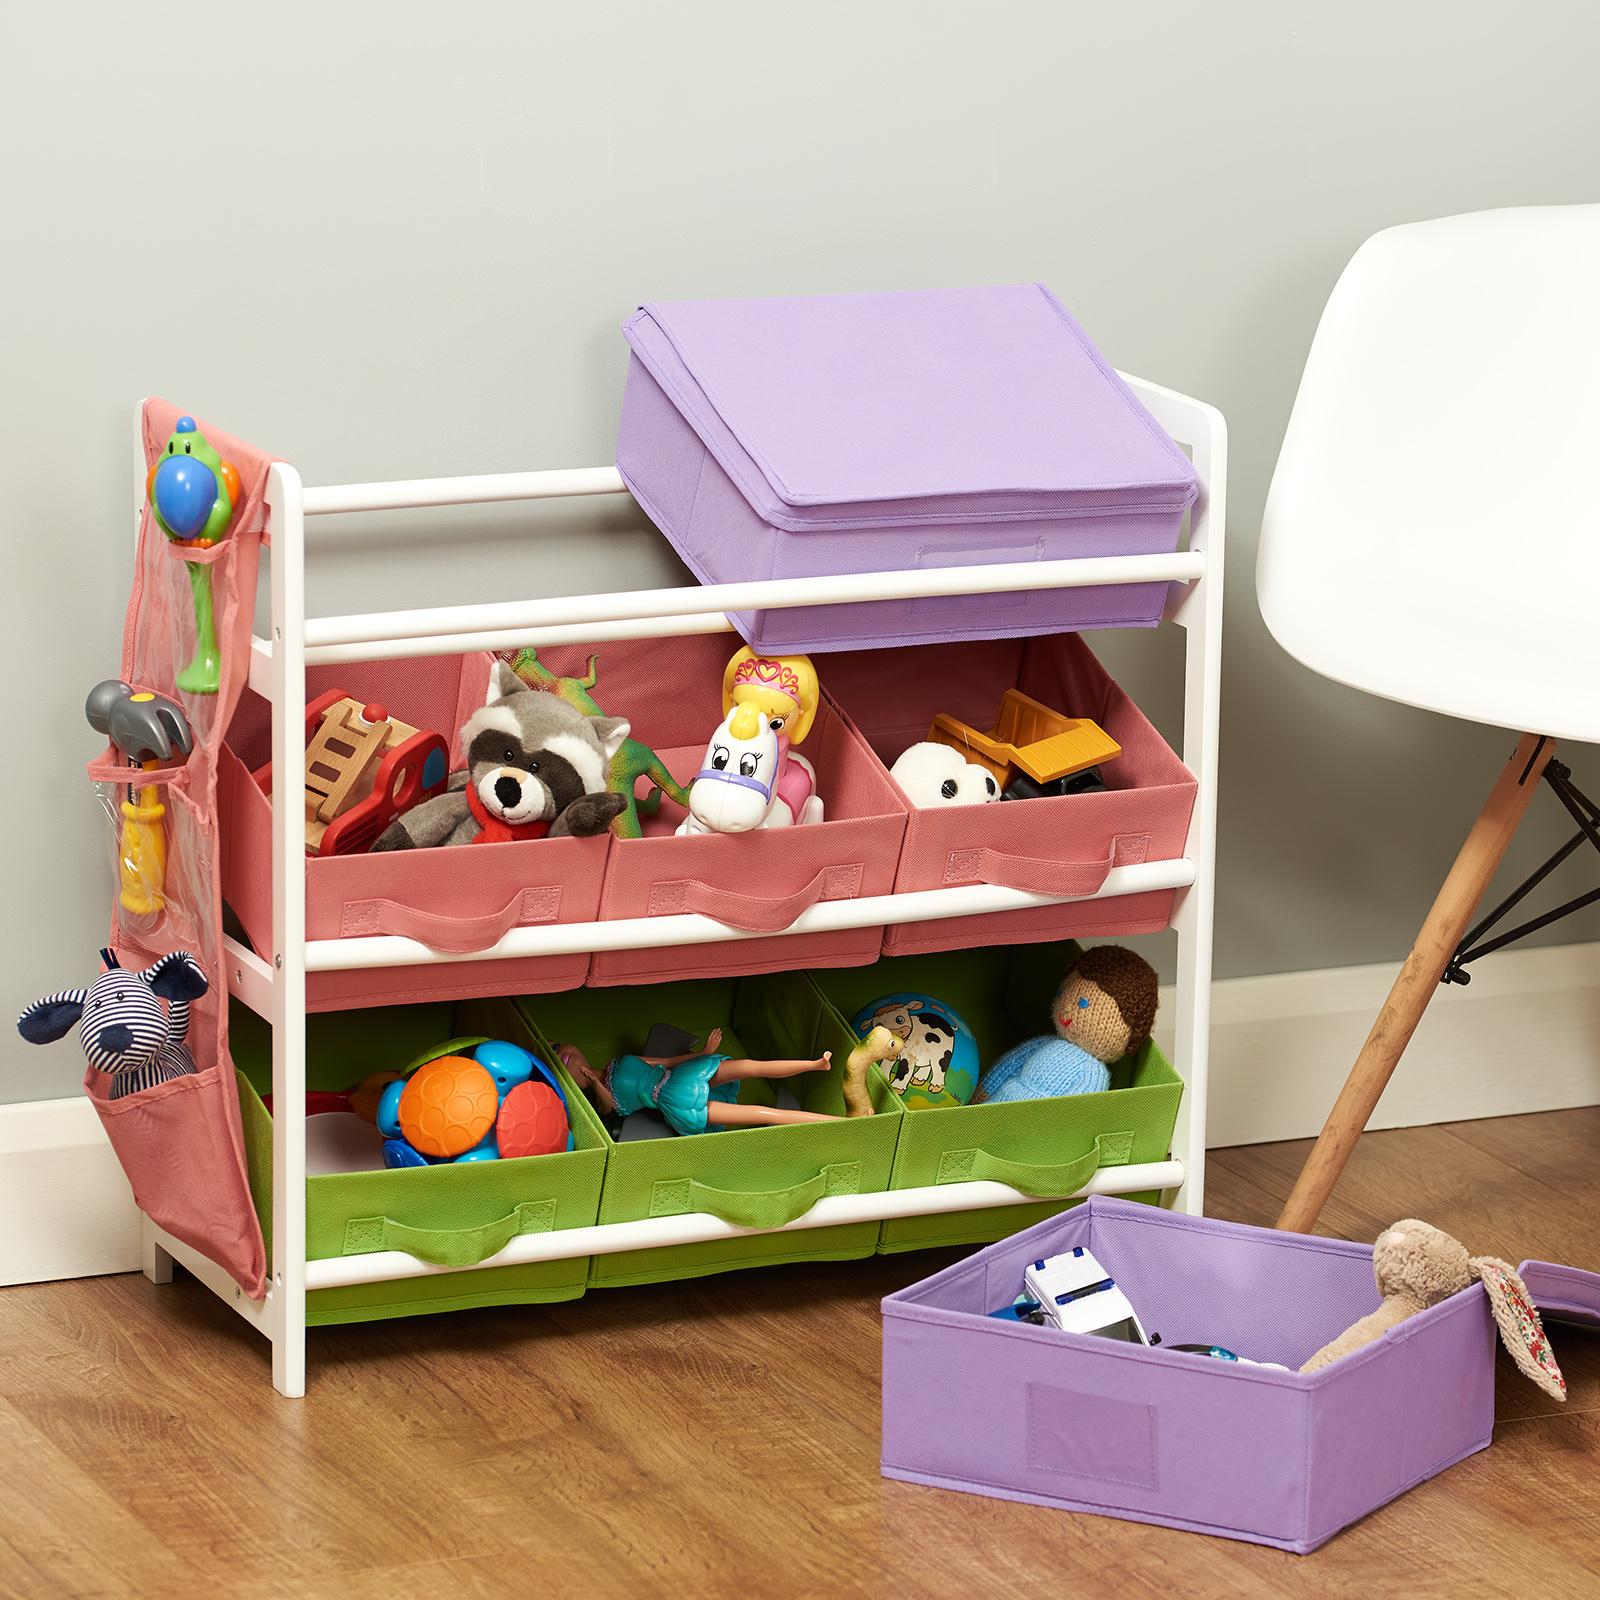 Kids Storage Cube Organizer Toy Box Kids Bedroom Furniture: Hartleys Childrens Bedroom Fun Shelf Drawers Kids Toy/Book